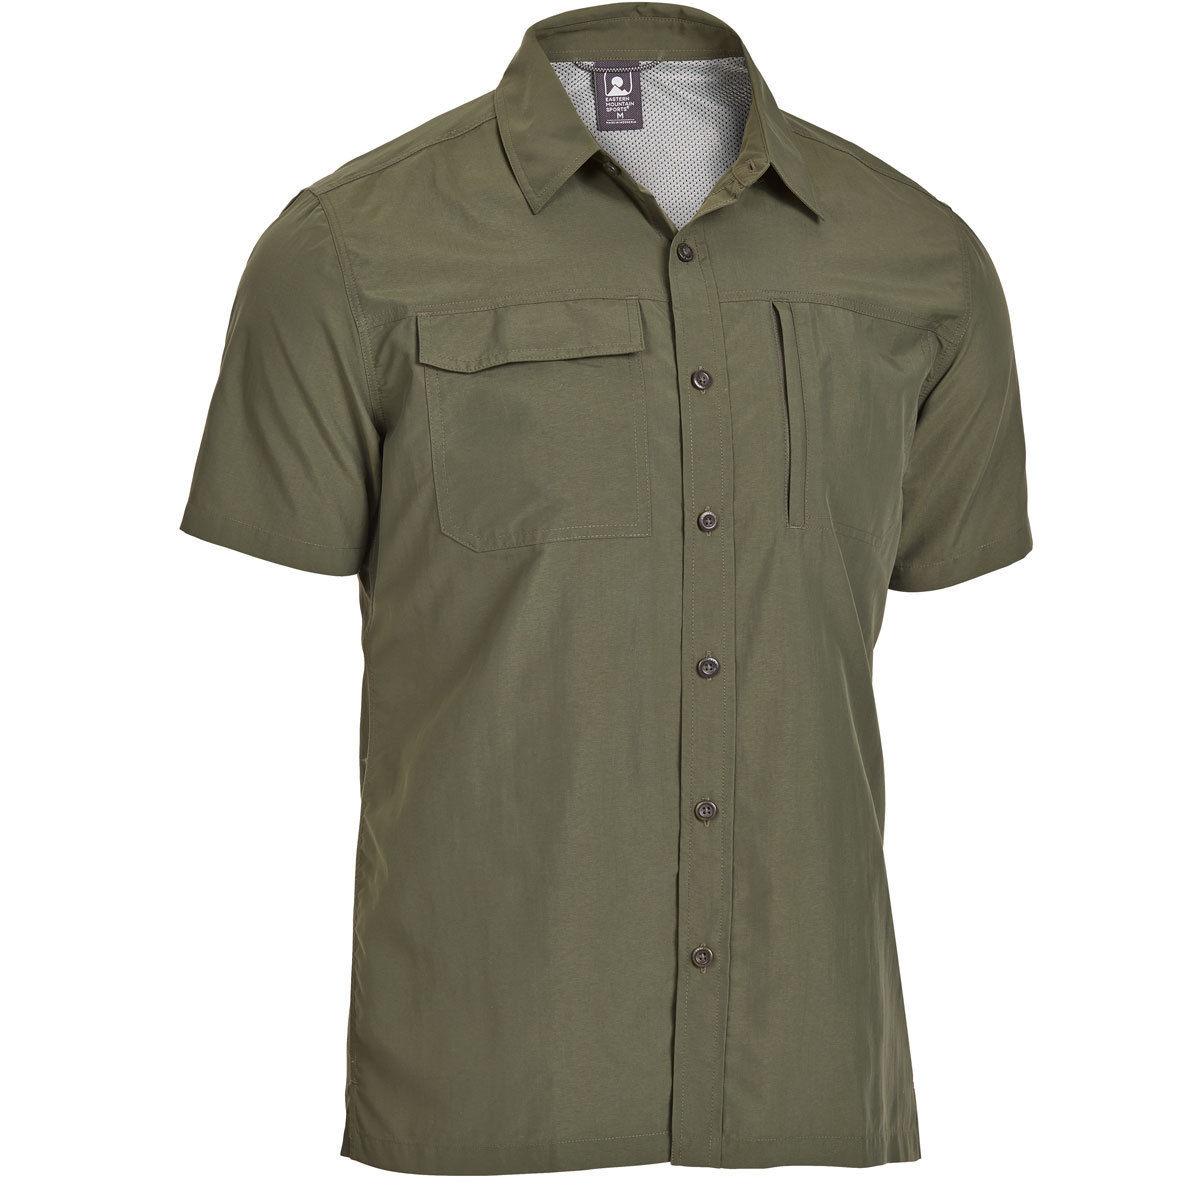 photo: EMS Trailhead Shirt, S/S hiking shirt